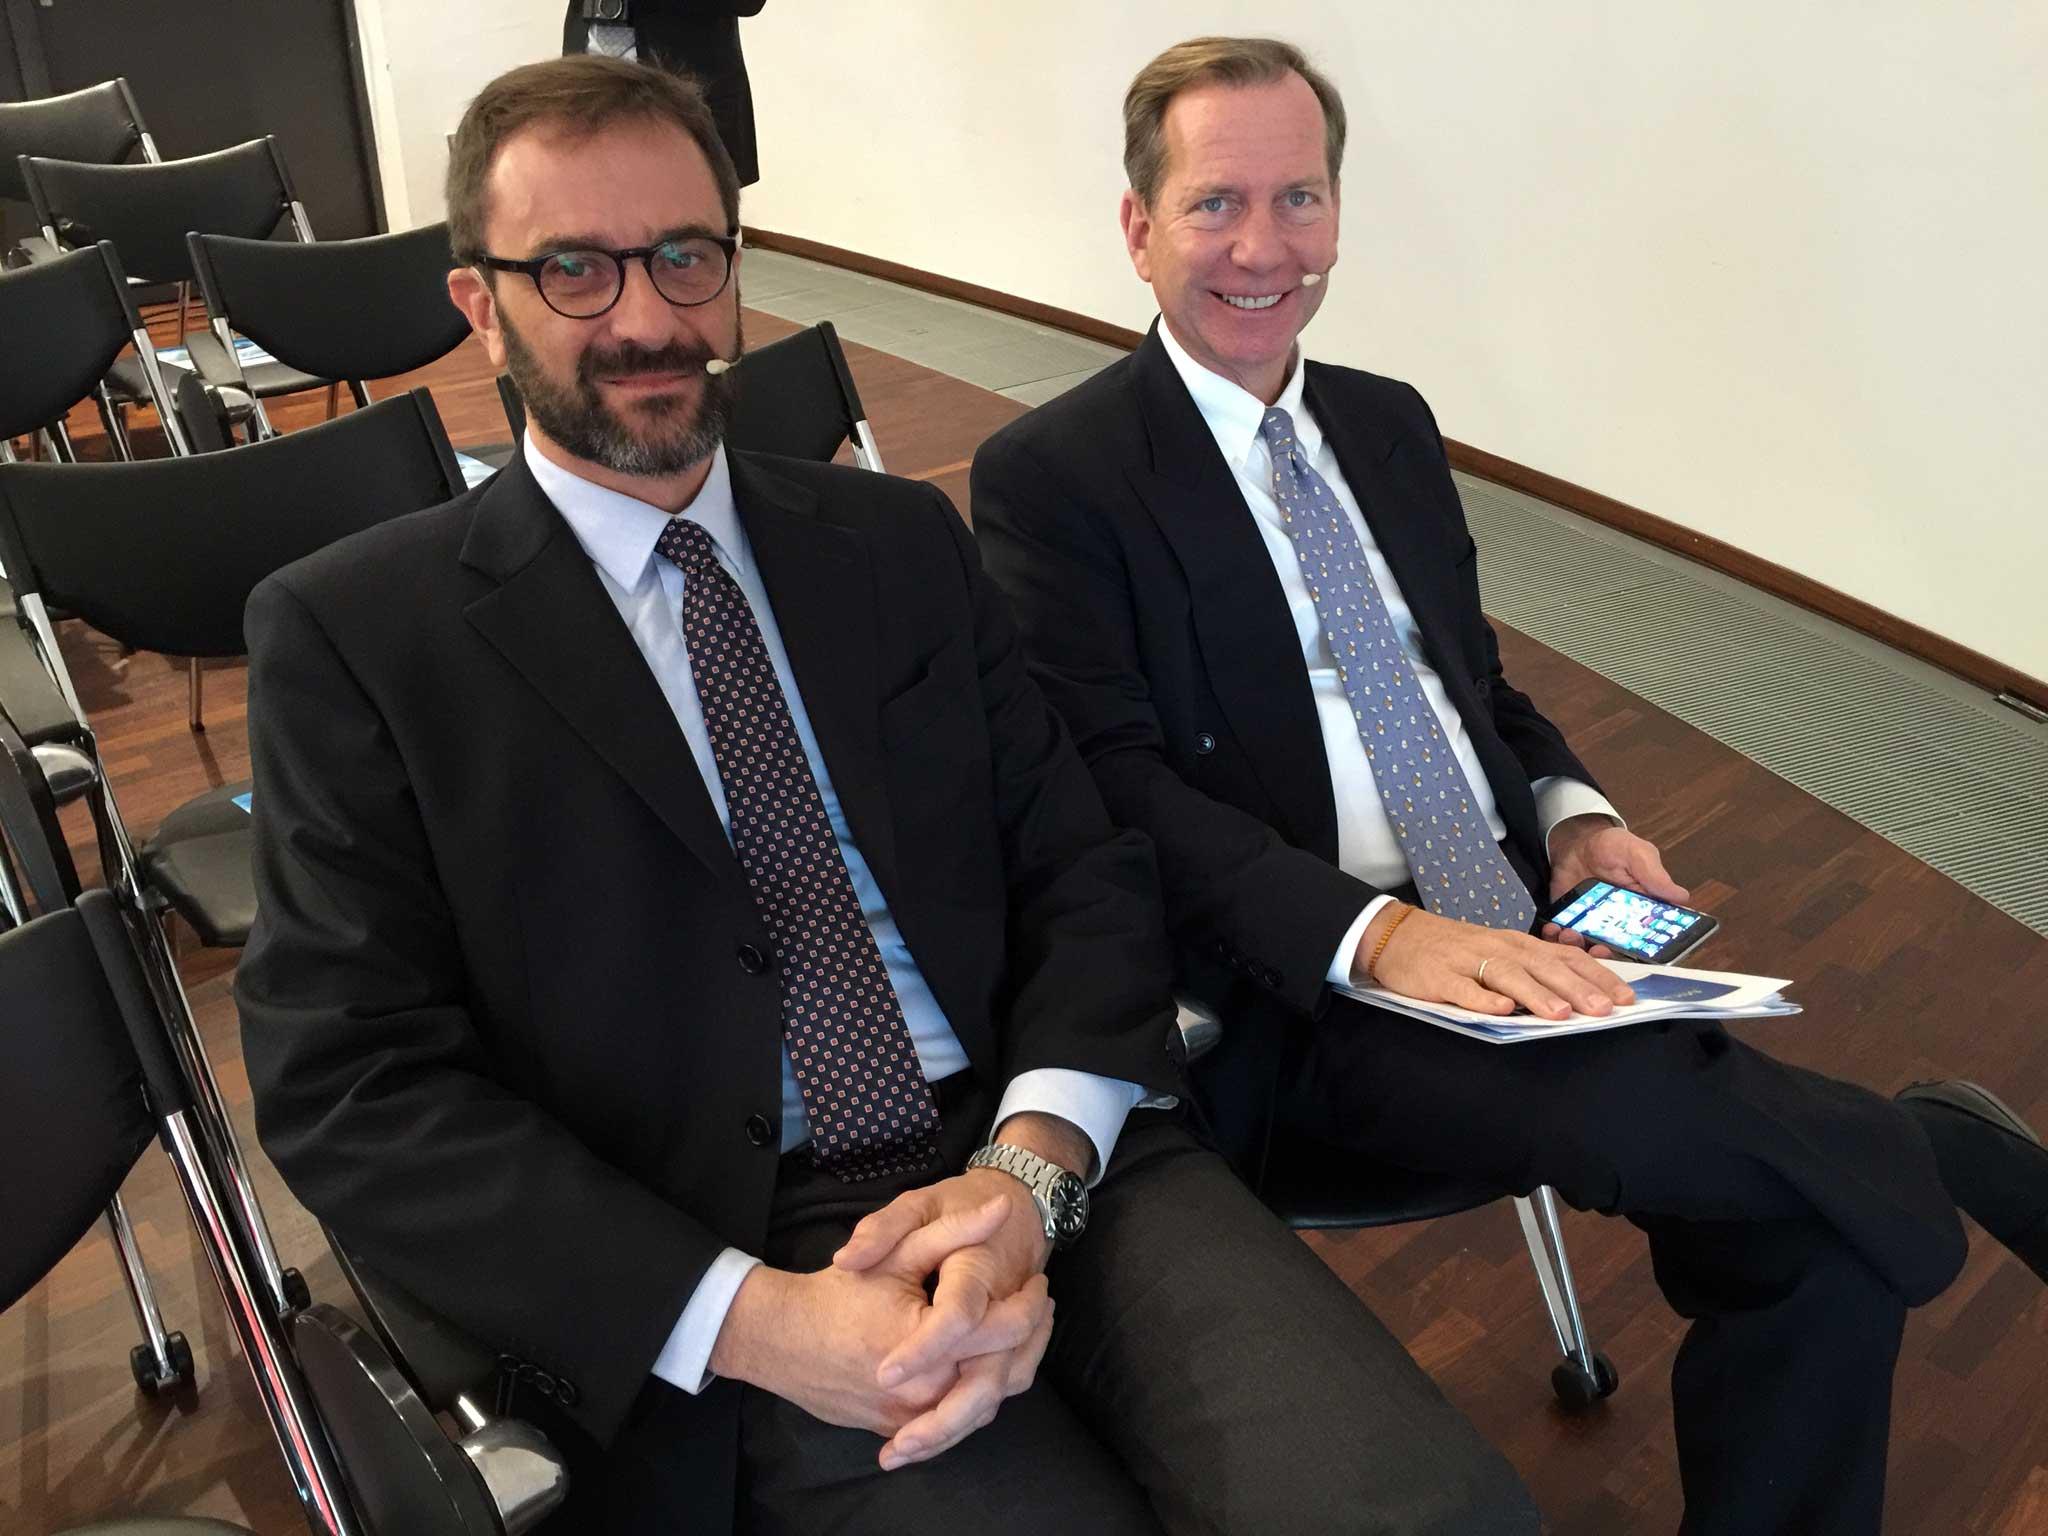 Marco Do e Michael Ellis